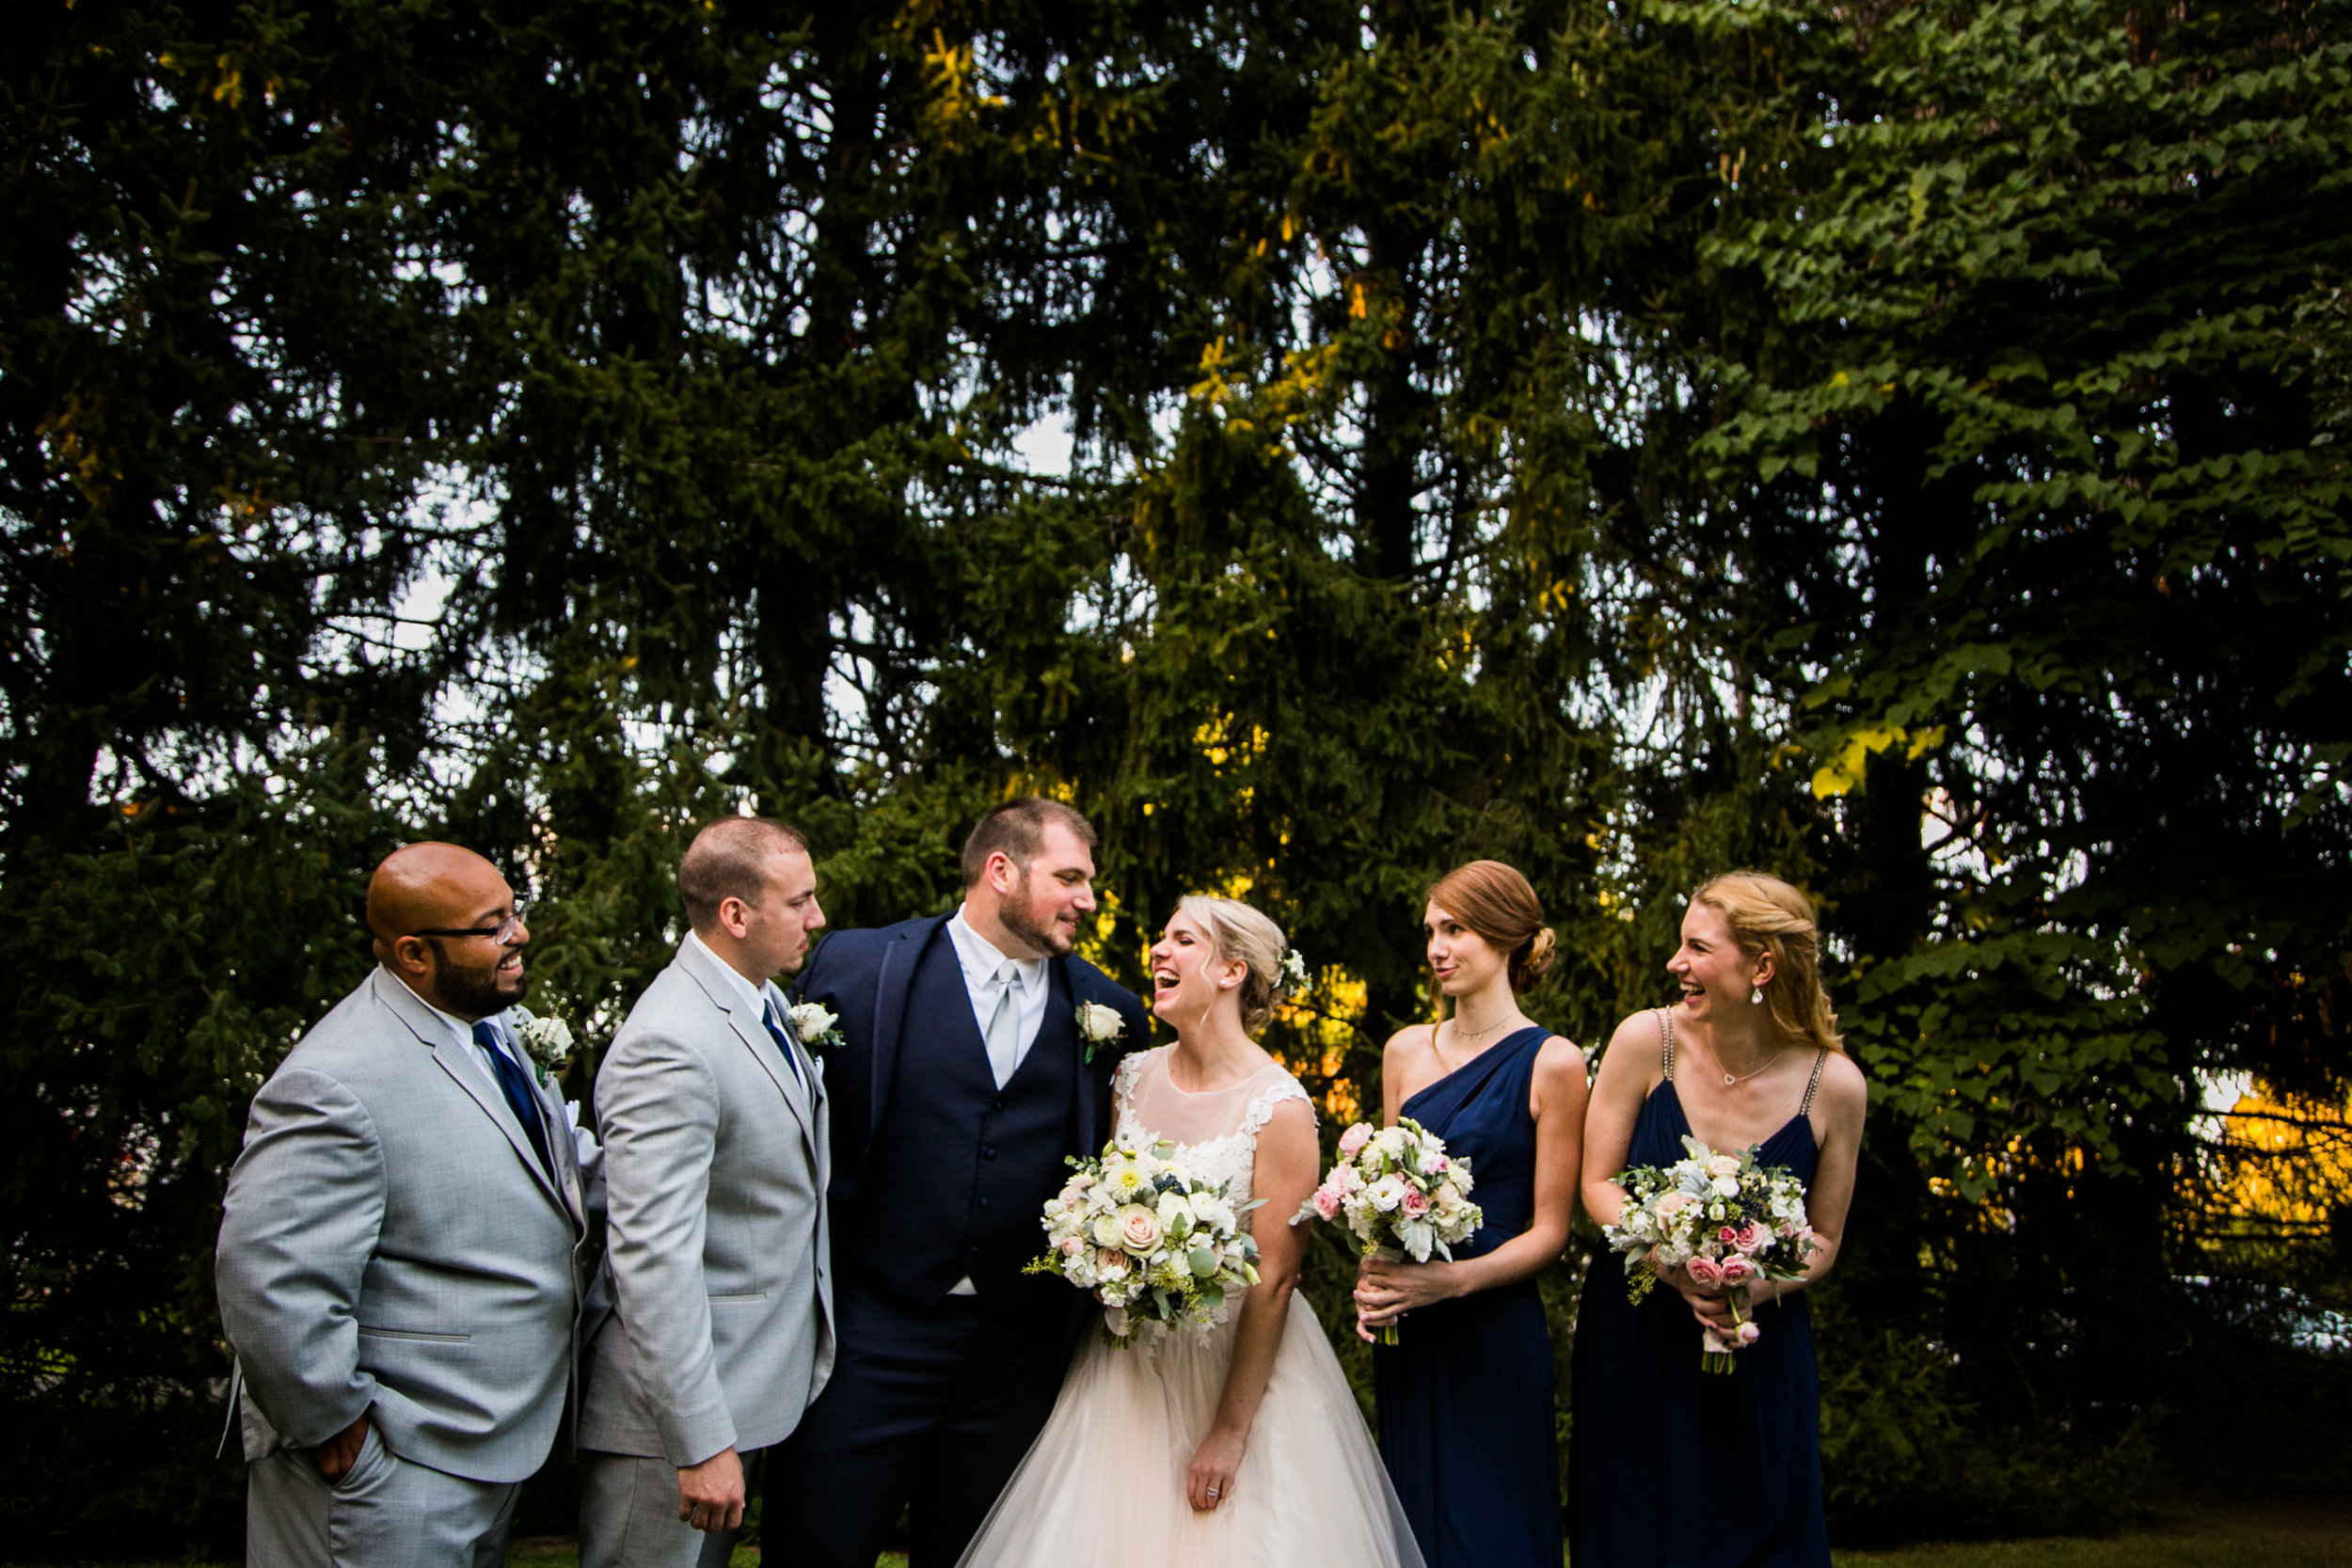 LA LUNA BANQUET HALL WEDDING BENSALEM - 061.jpg